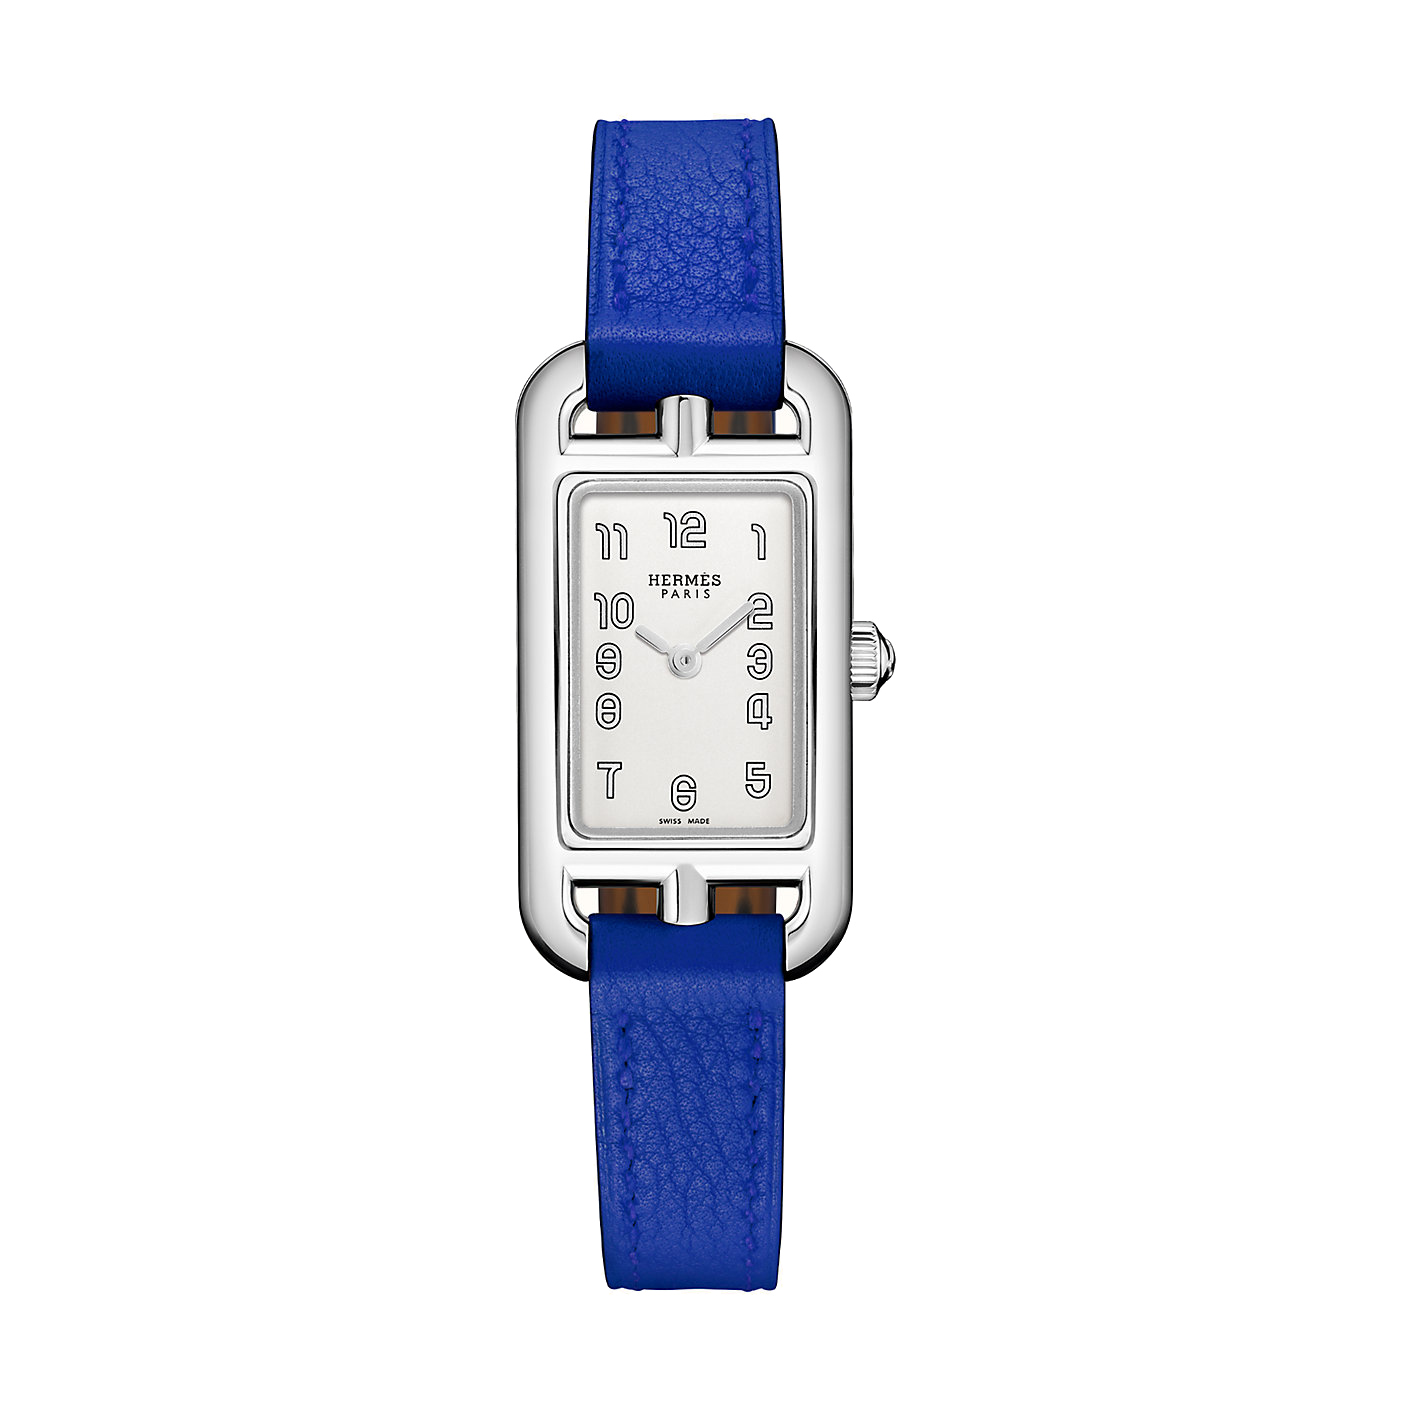 Hermès-nantucket-17-x-23mm-Hall-of-Time-044190WW00